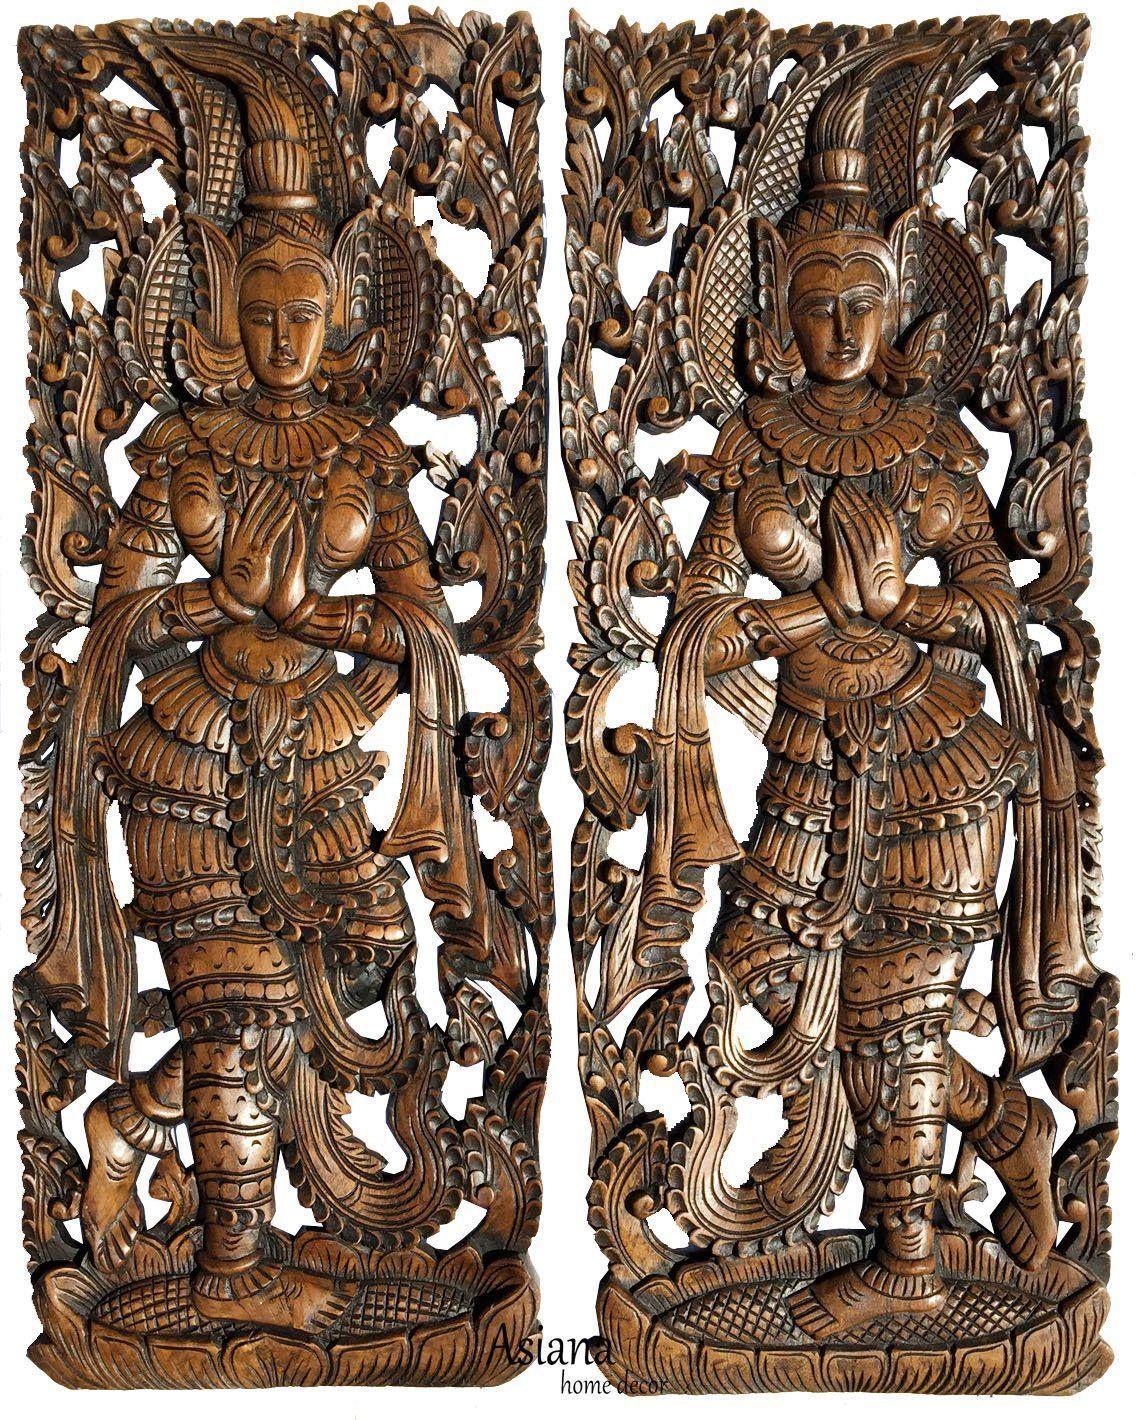 Traditional thai sawaddee figure wall art panels asian home decor